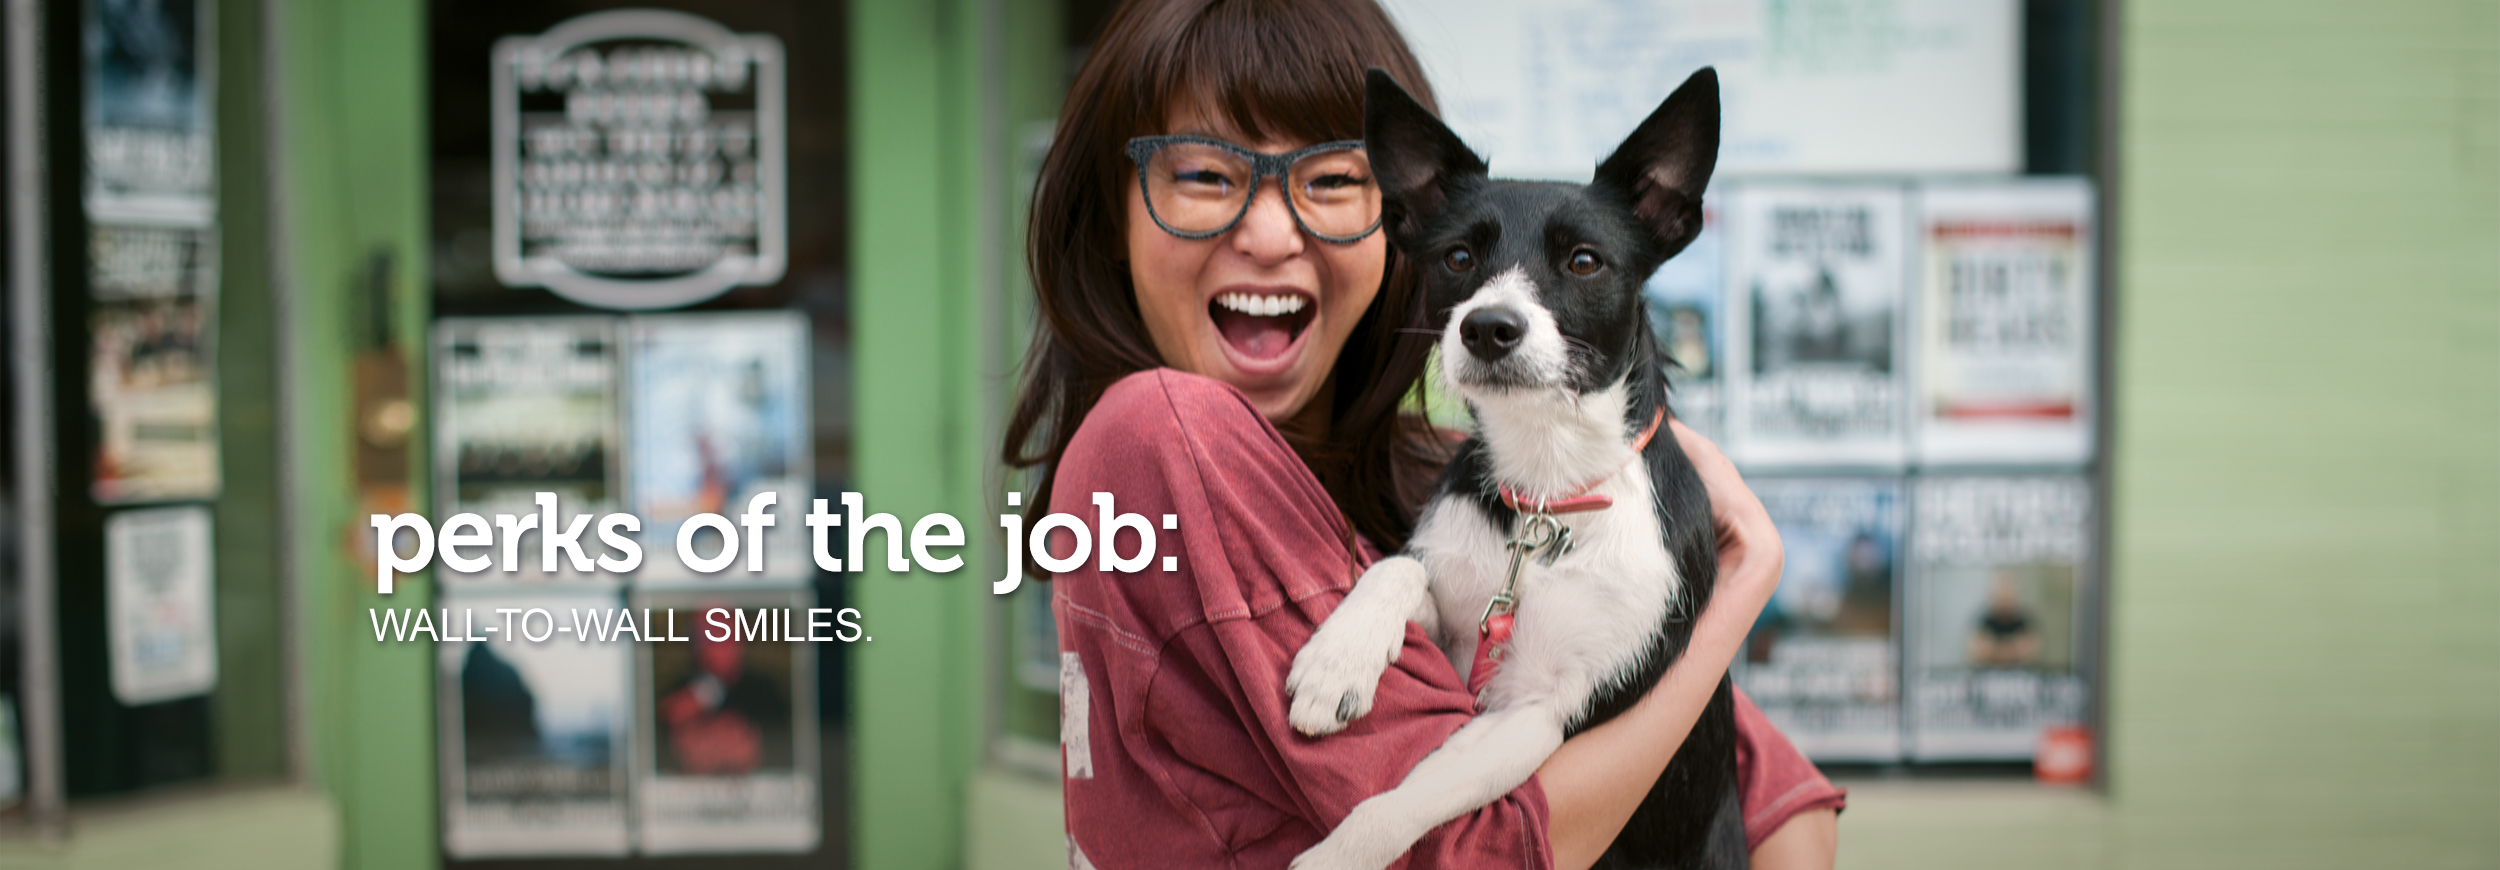 Petco - perks of the job big